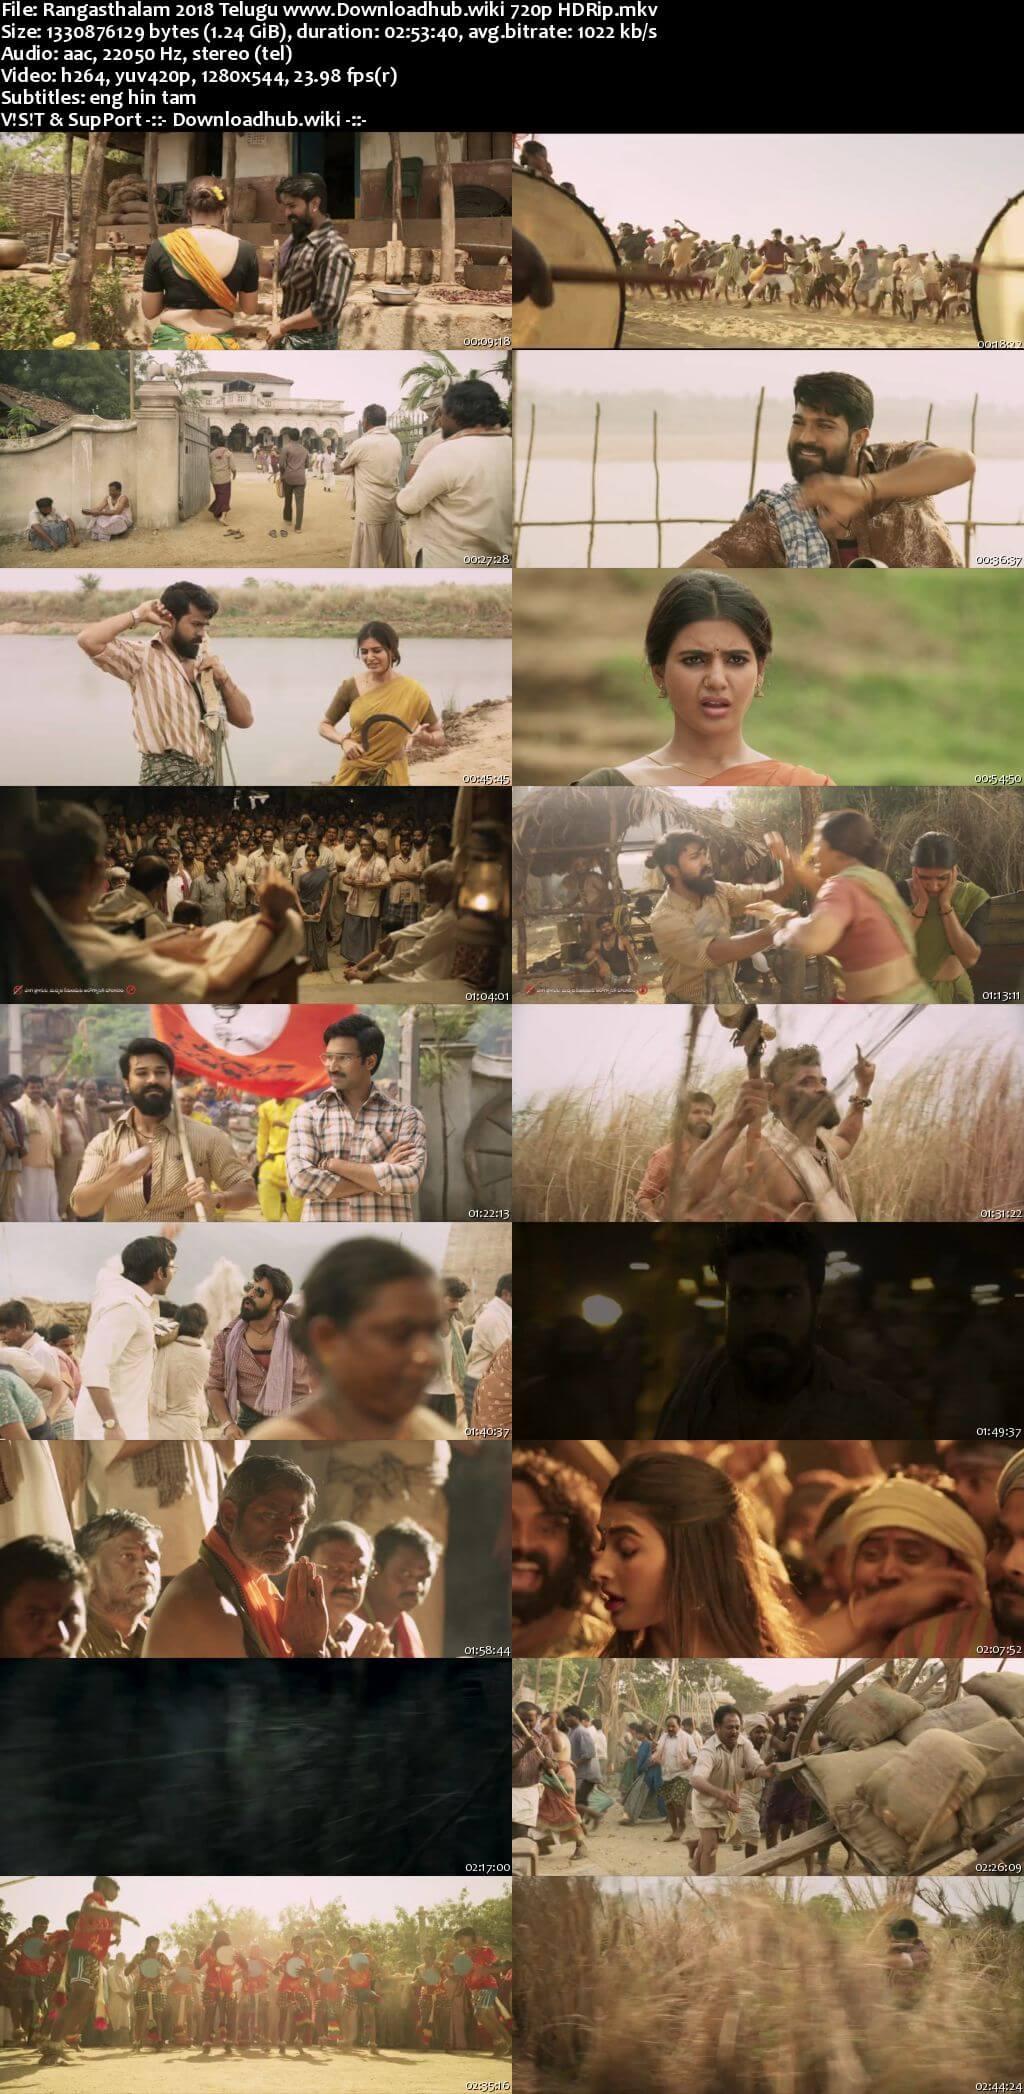 Rangasthalam 2018 Telugu 720p HDRip MSubs